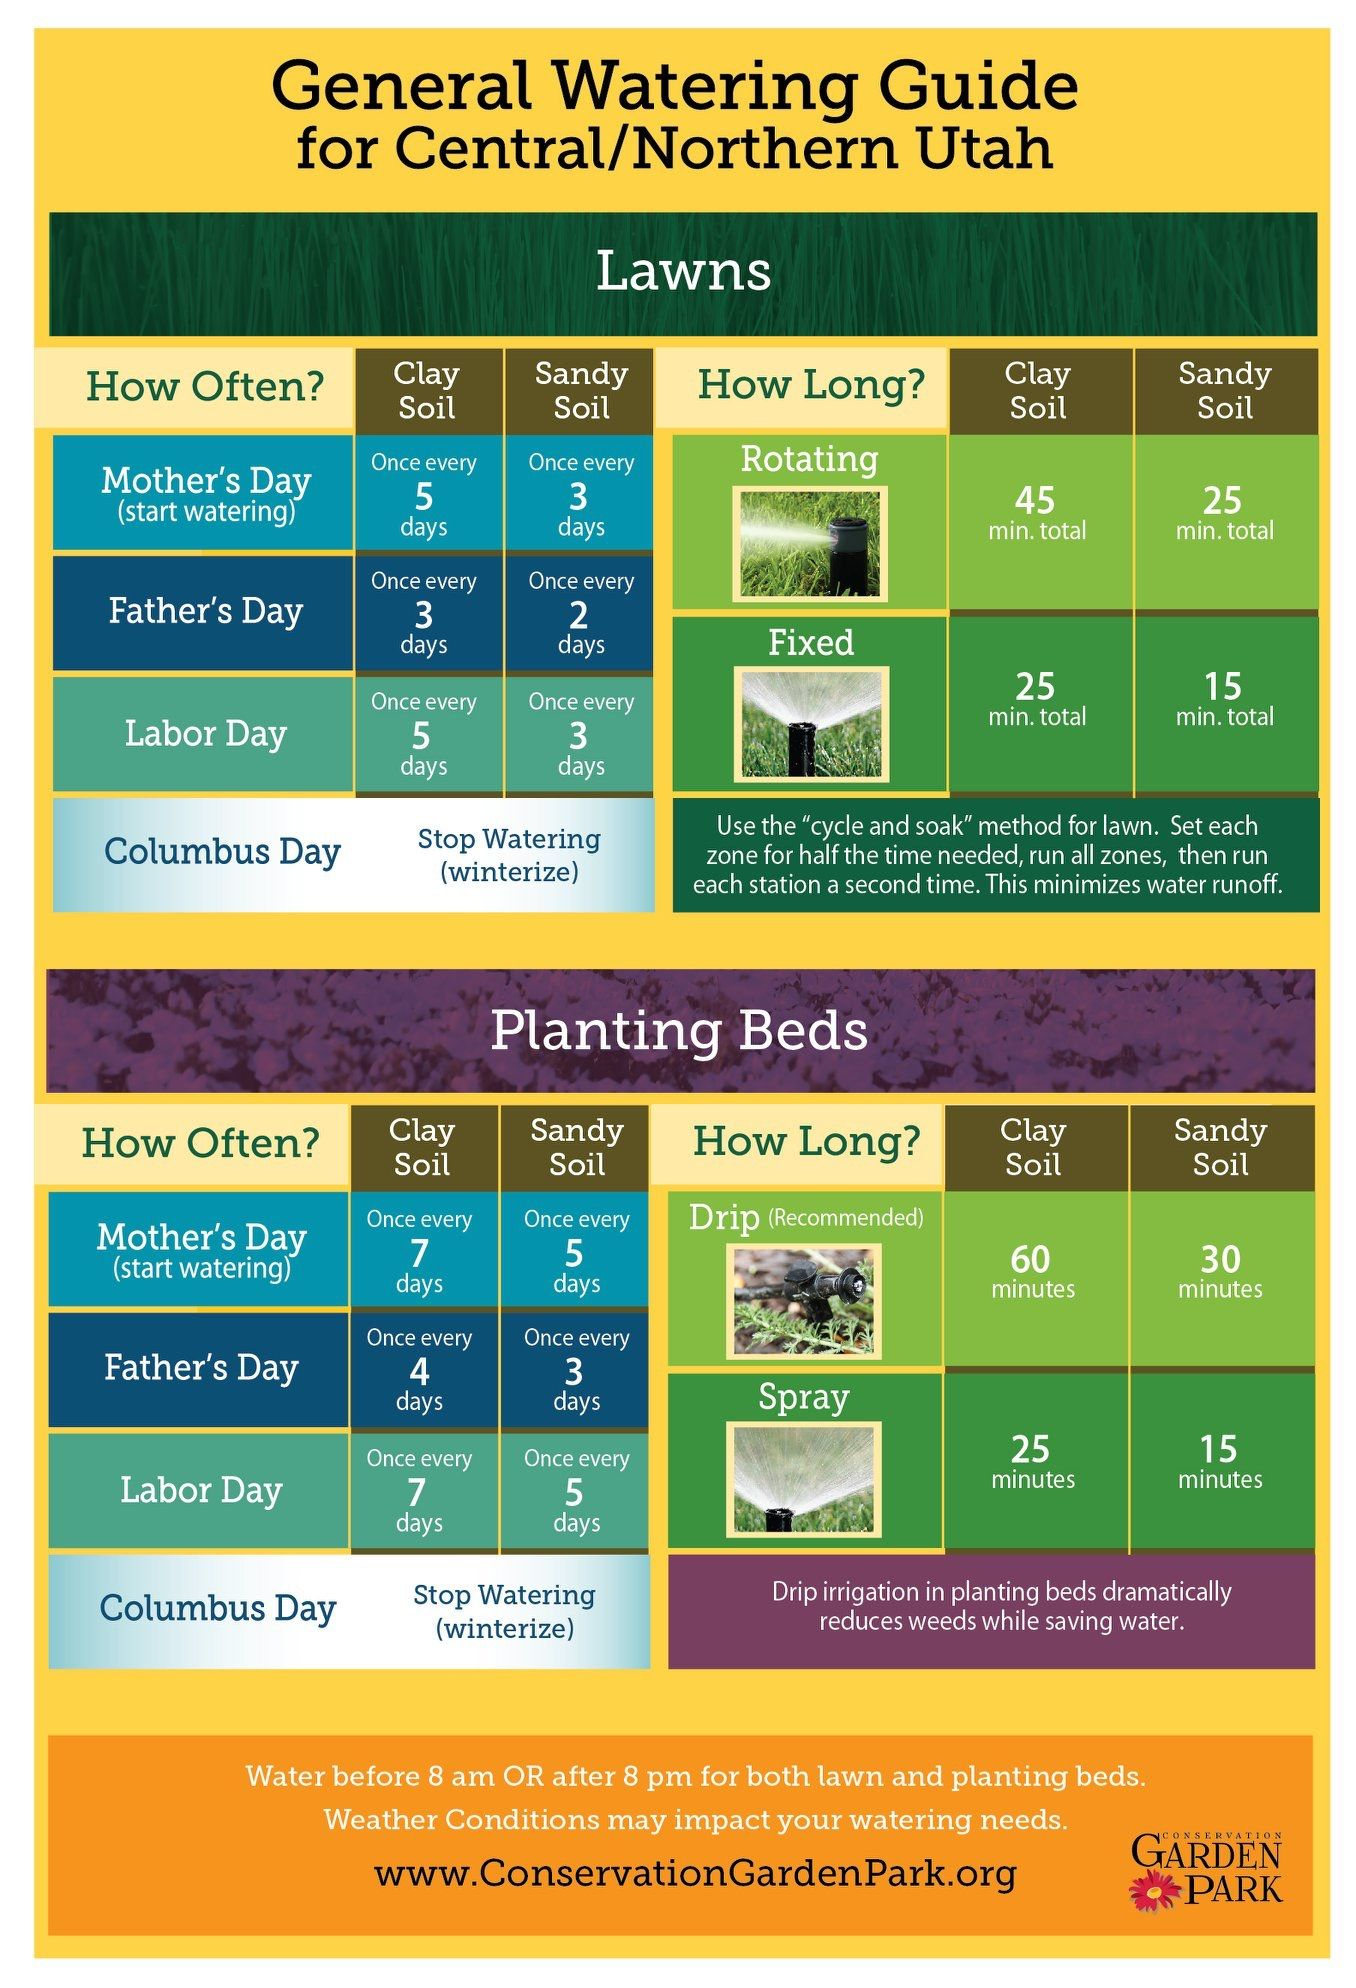 Centralnorthern utah watering guide lawn fertilizer